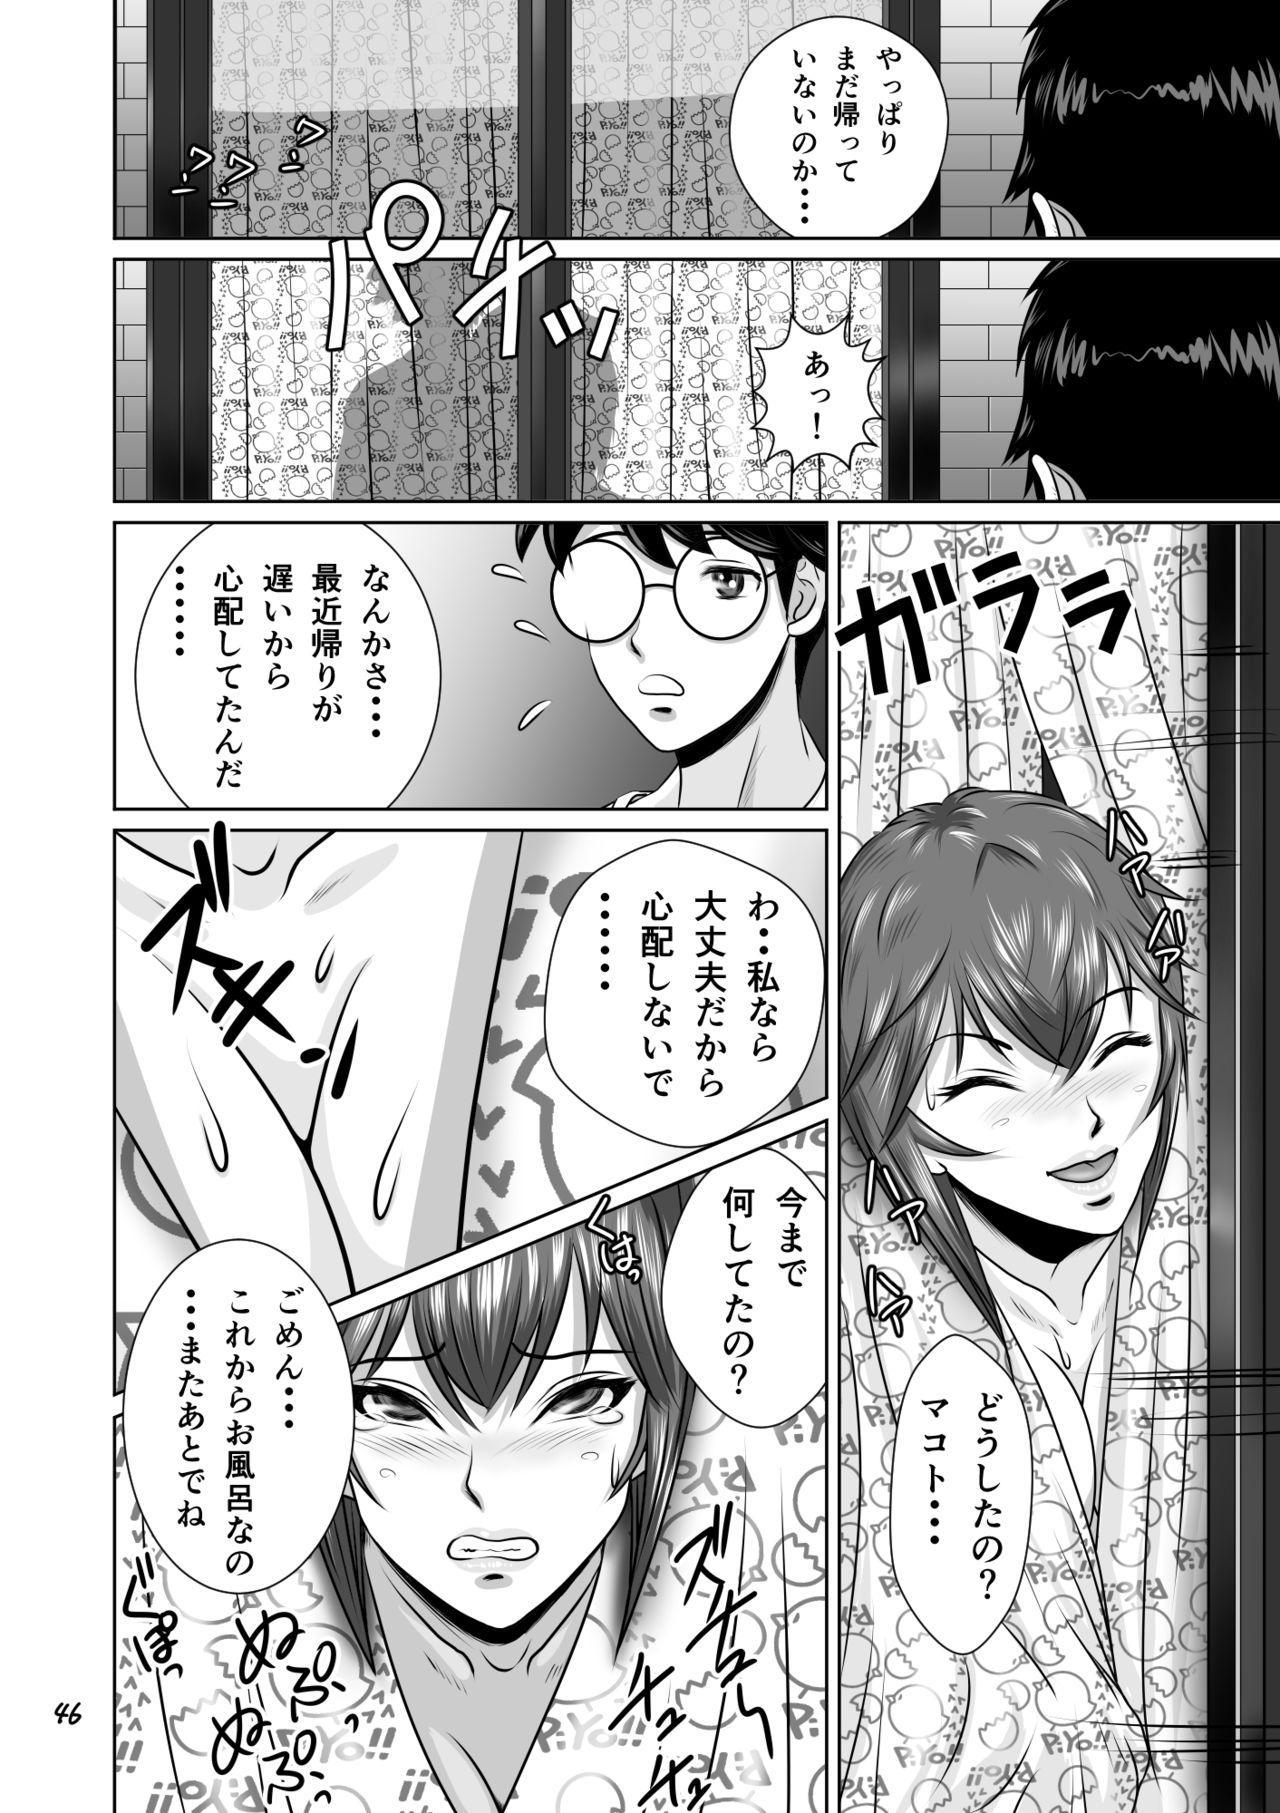 Netorare Osananajimi Haruka-chan Kiki Ippatsu!! 46